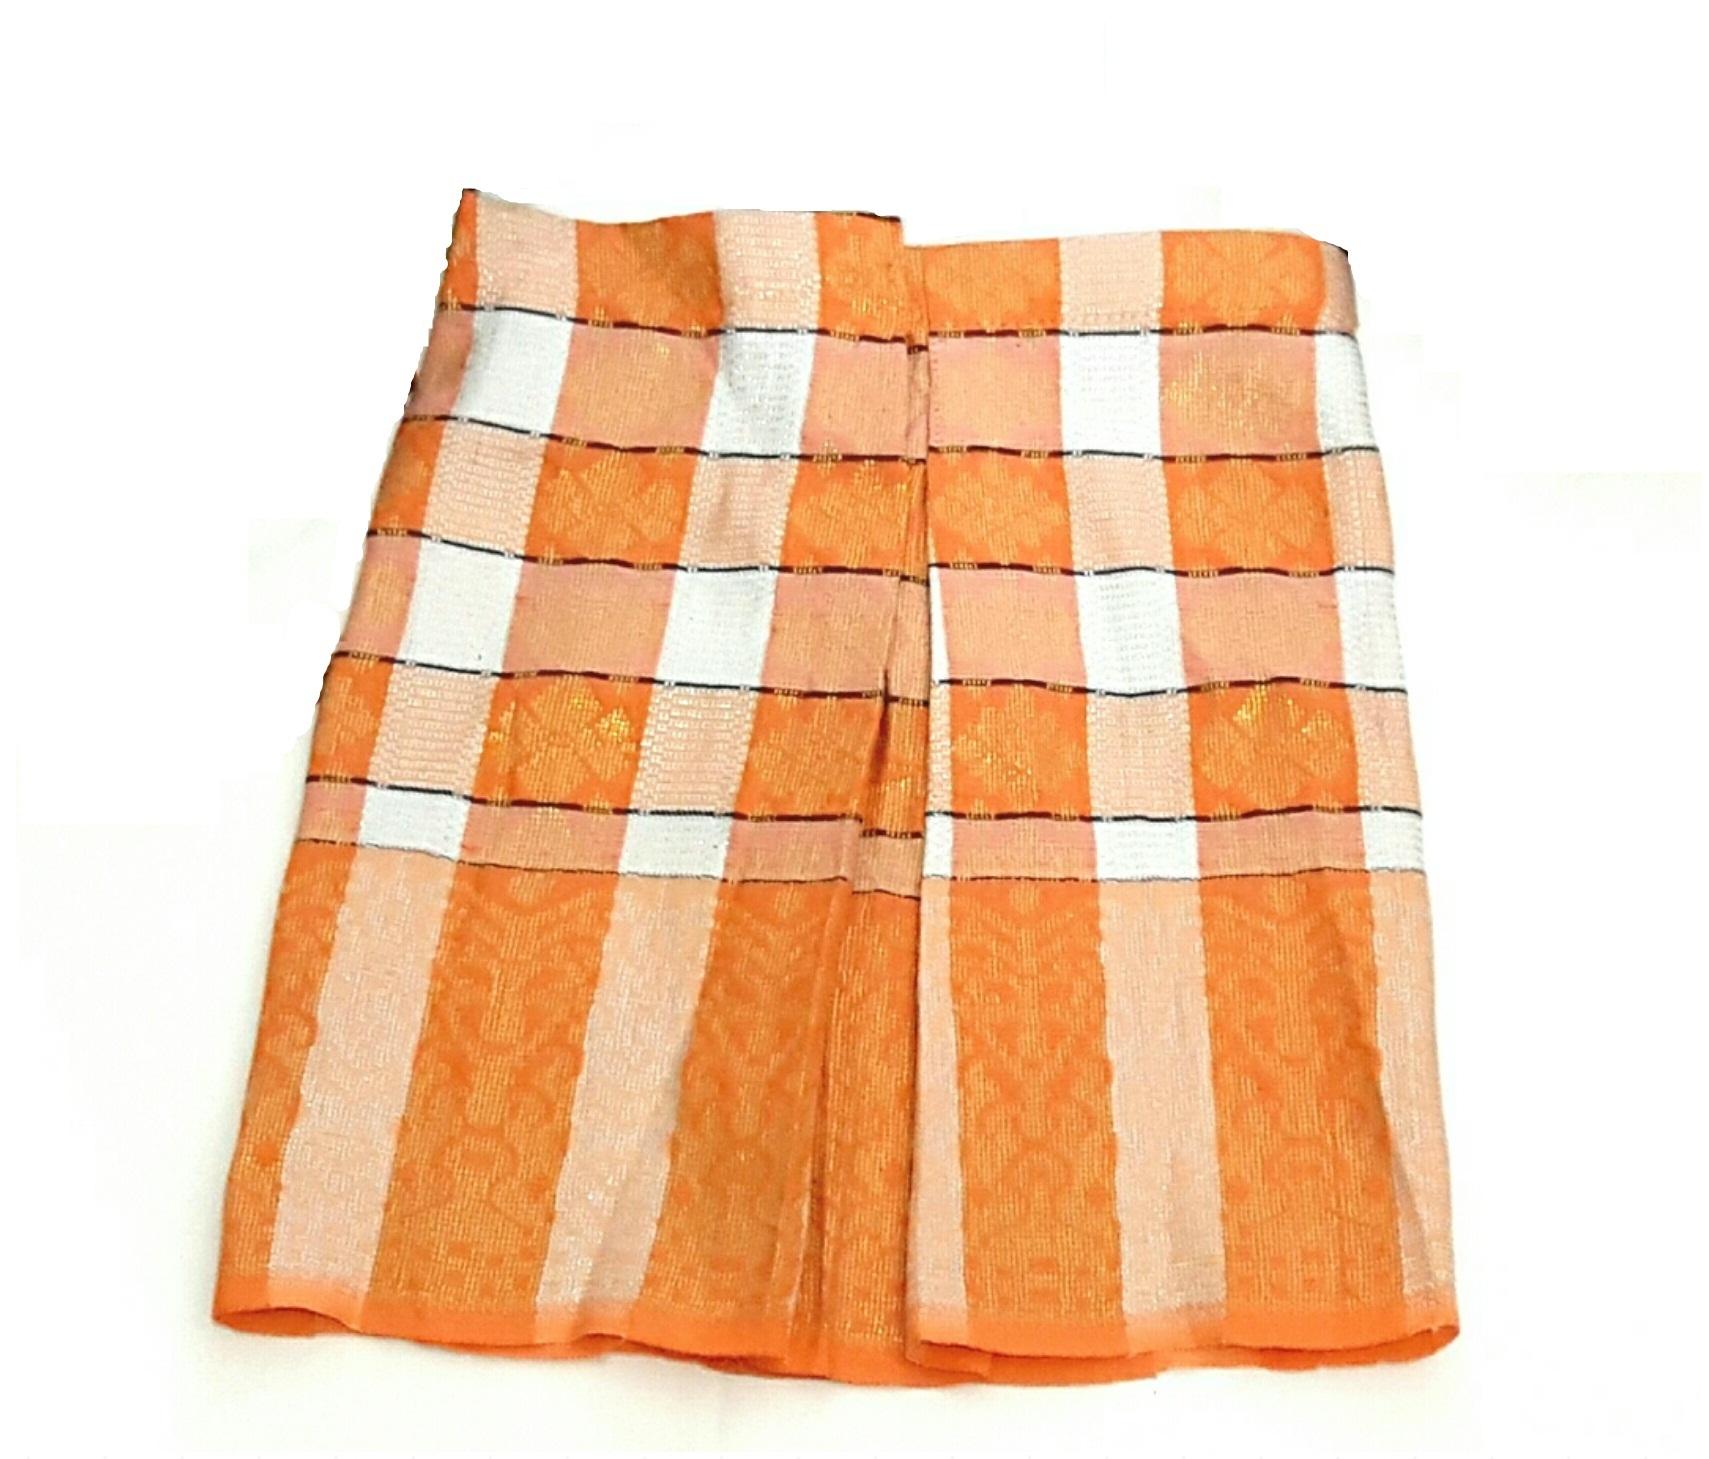 Sampin Kanak2 Orange 2.jpg